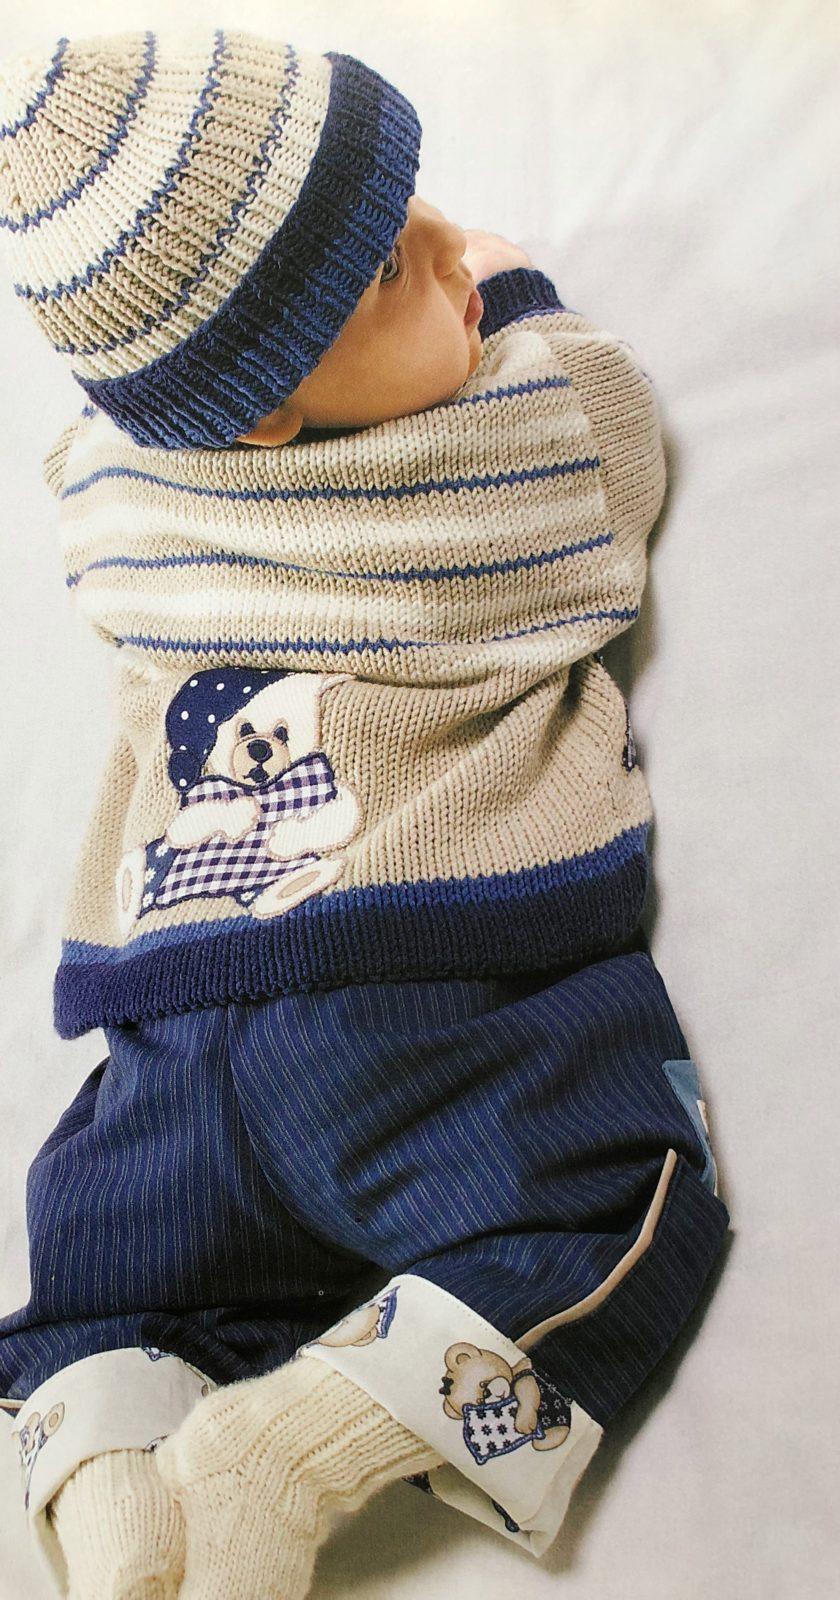 Костюм для малыша 6 месяцев спицами